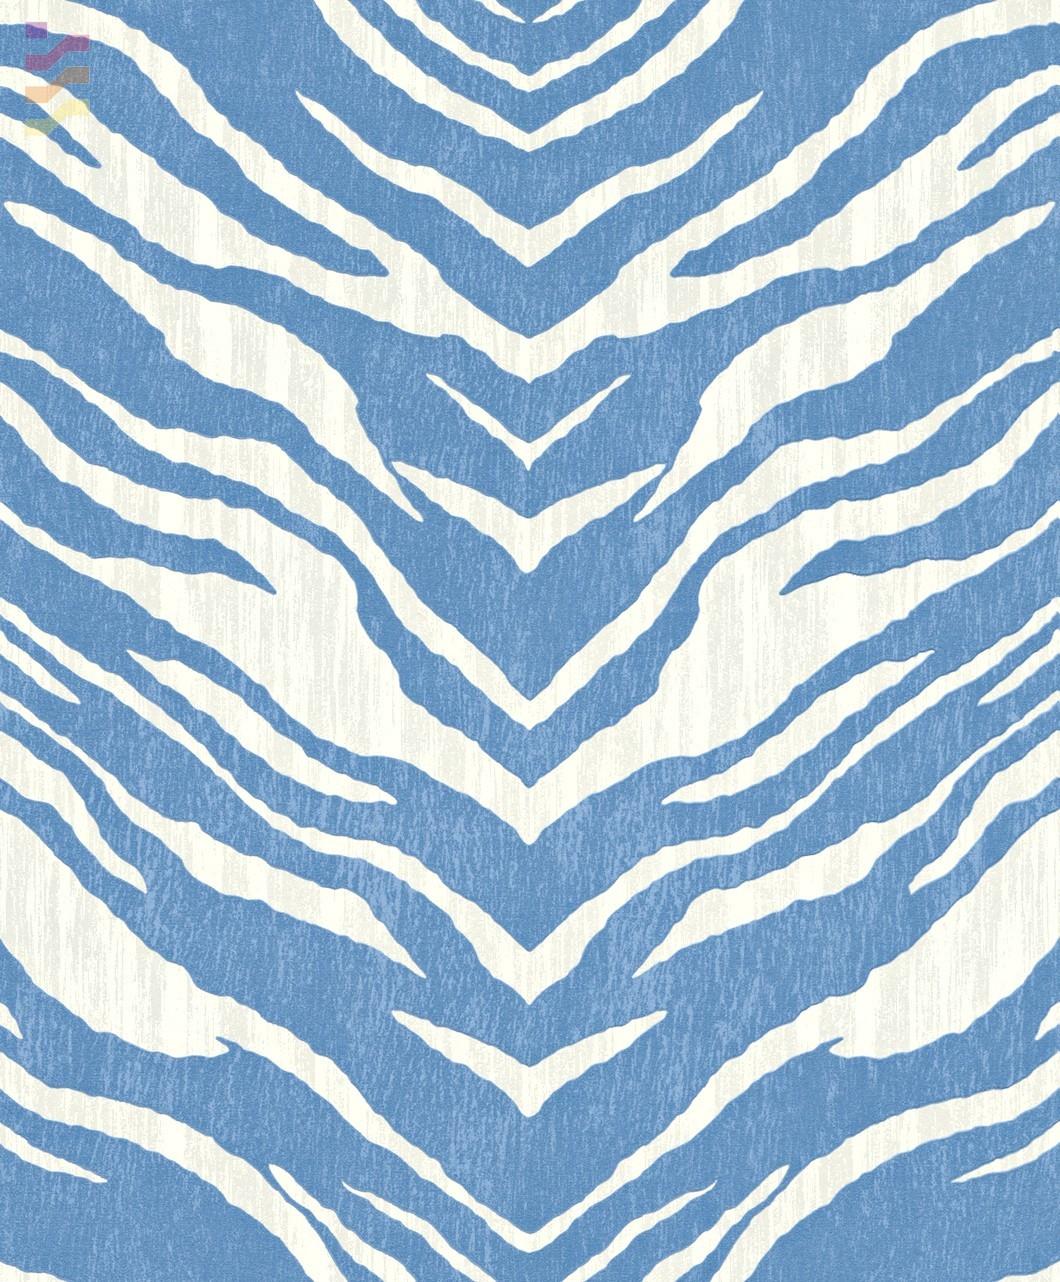 wzór zebra niebiesko biała